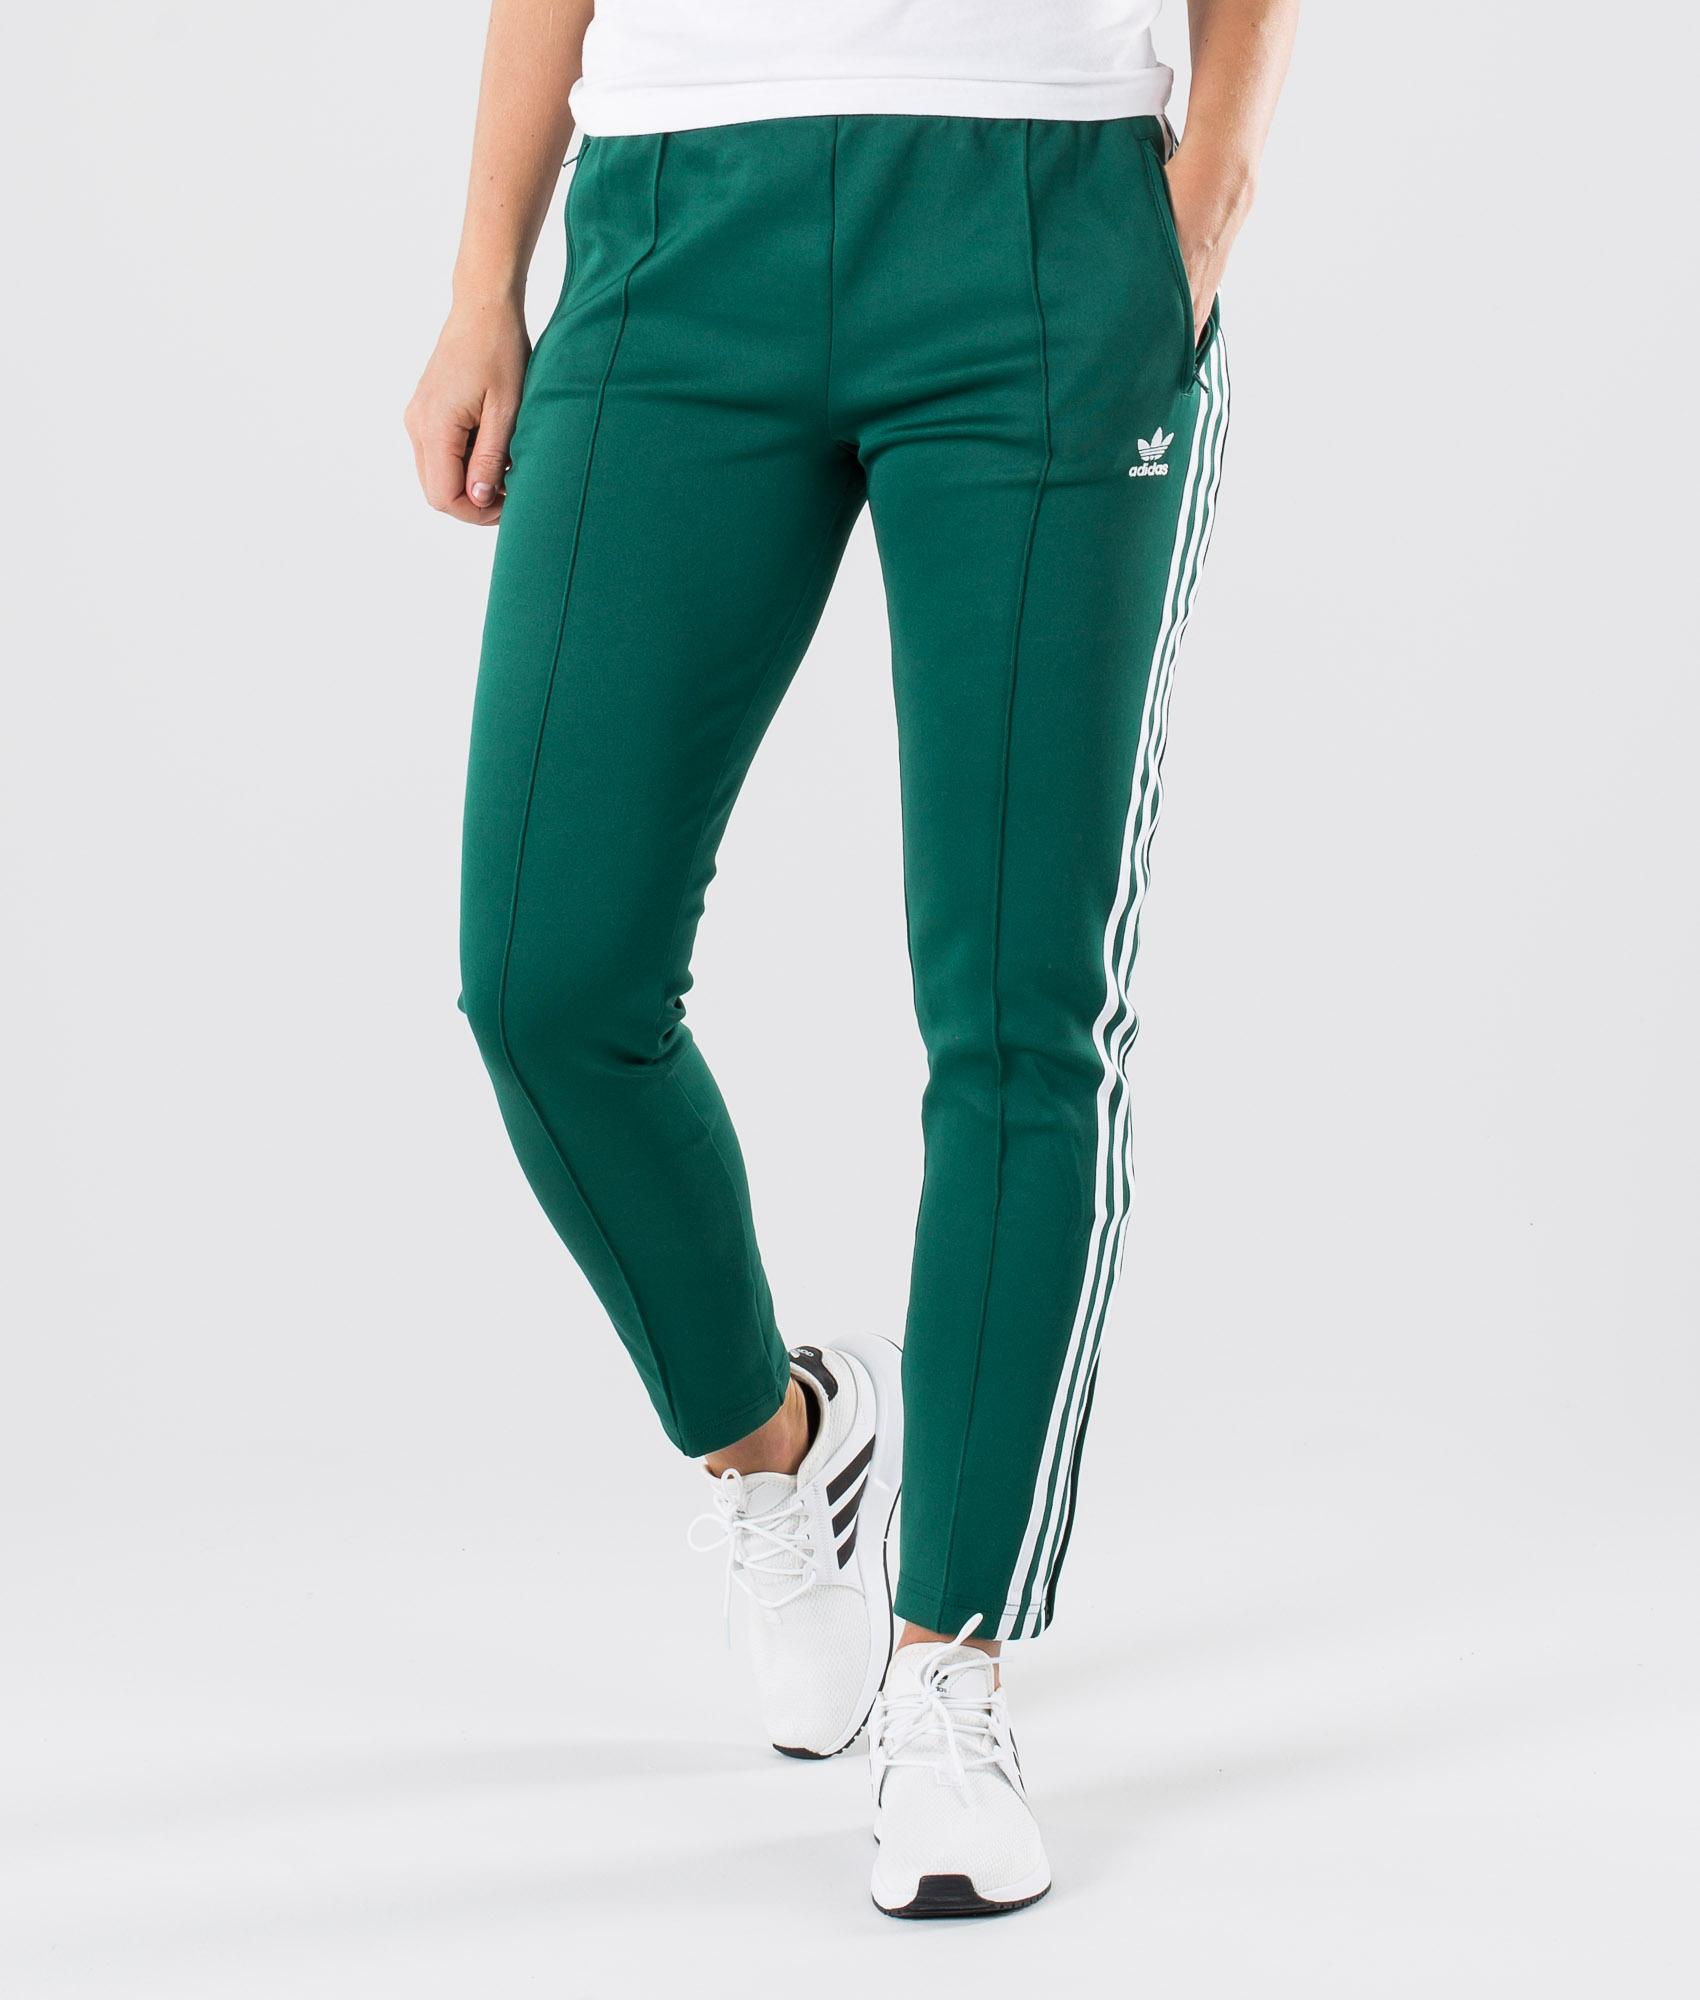 Originals Collegiate Adidas Green Tp Sst Pantalon k8nwOPXN0